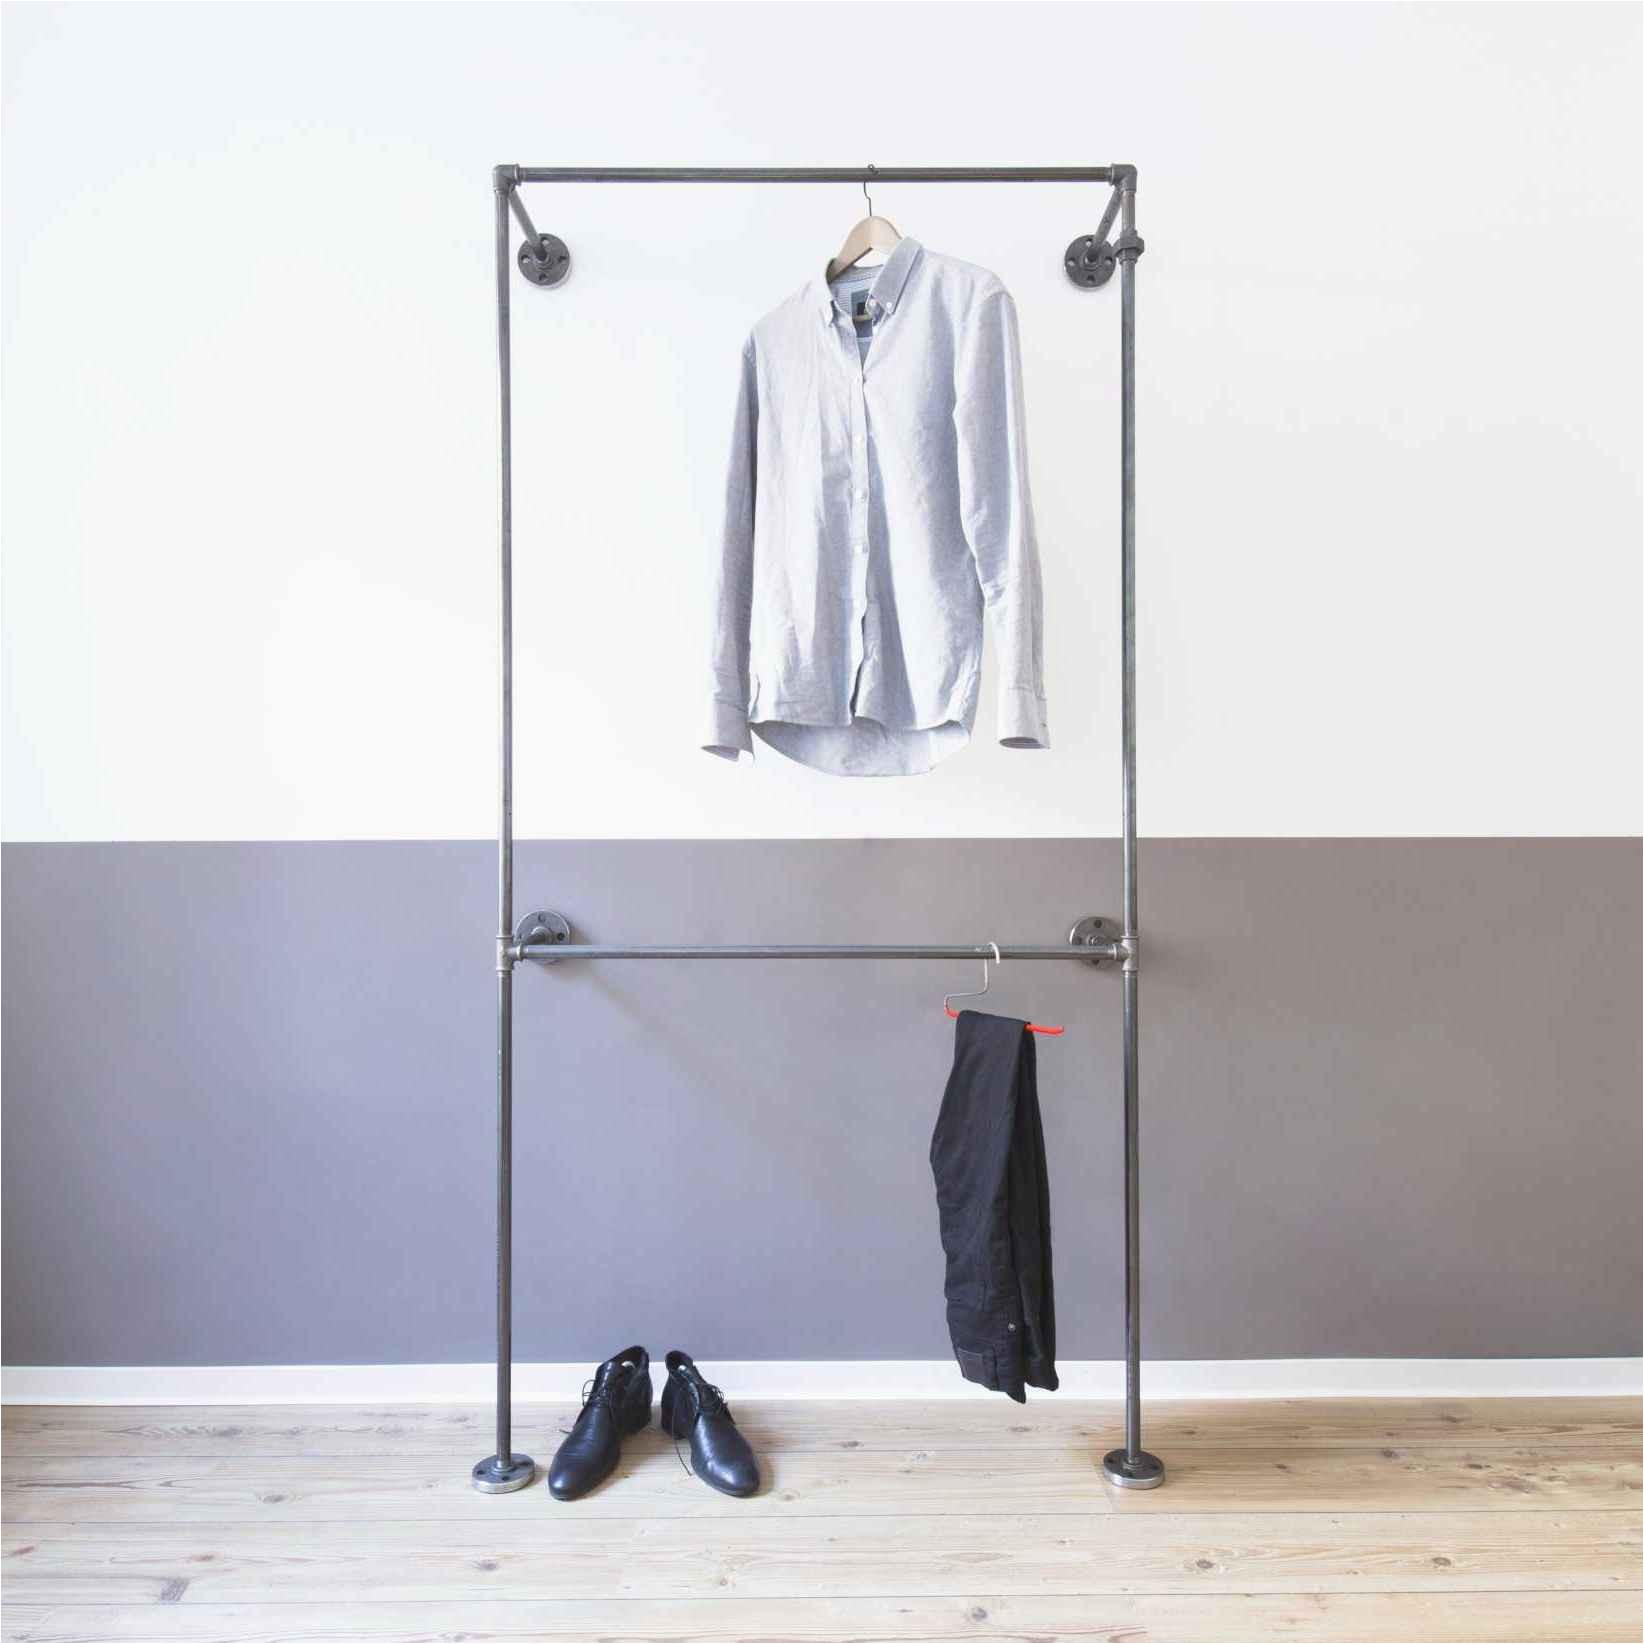 3 black friday pax kleiderschrank bewundernswert schrank planen beautiful spigel line elegant schrank spiegel 0d of 57 frisch pax